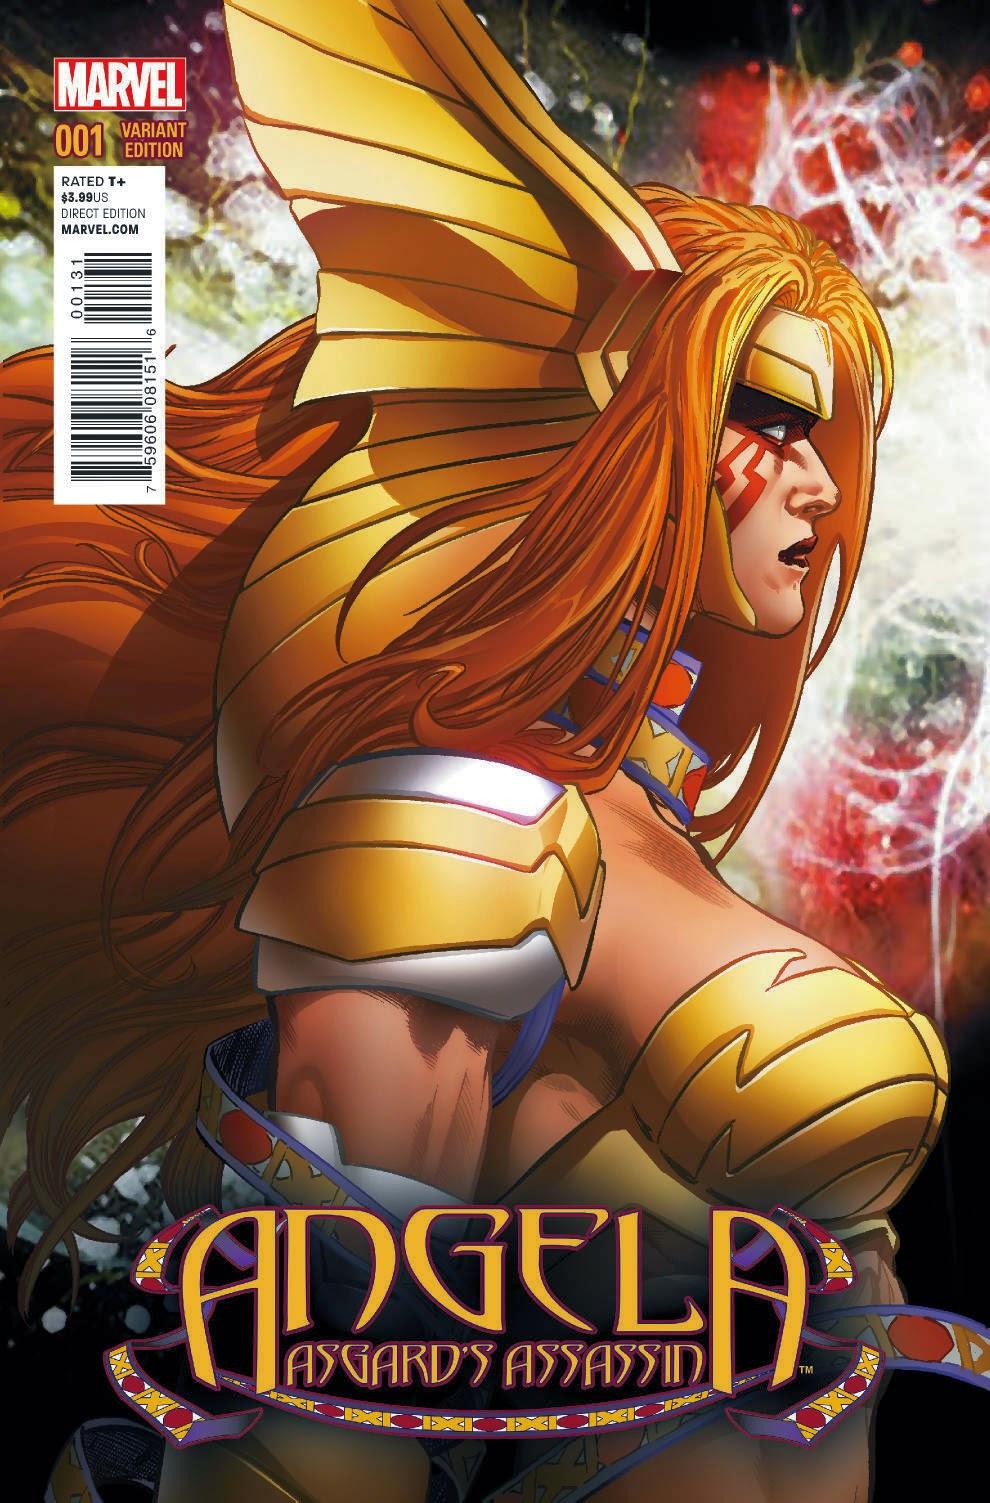 Angela_Asgard's_Assassin_1_Jimenez_Variant.jpg